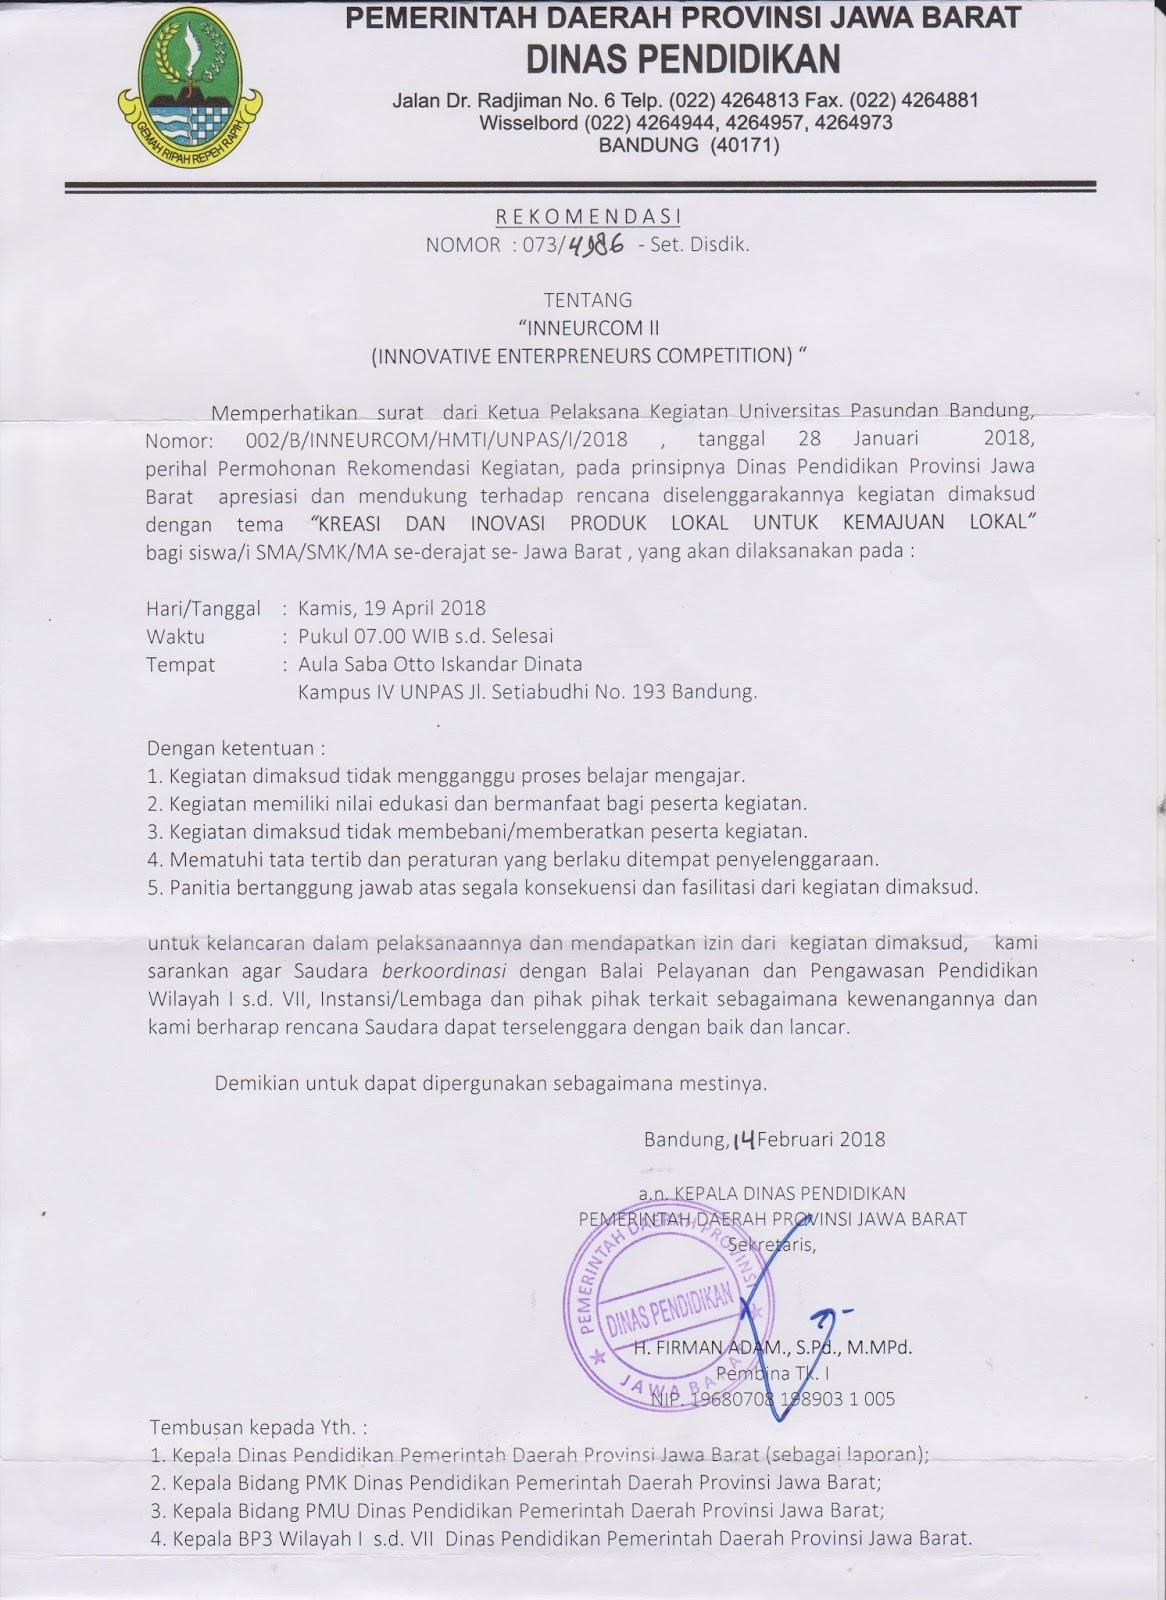 Surat Rekomendasi Dinas Pendidikan Jawa Barat Inneurcom